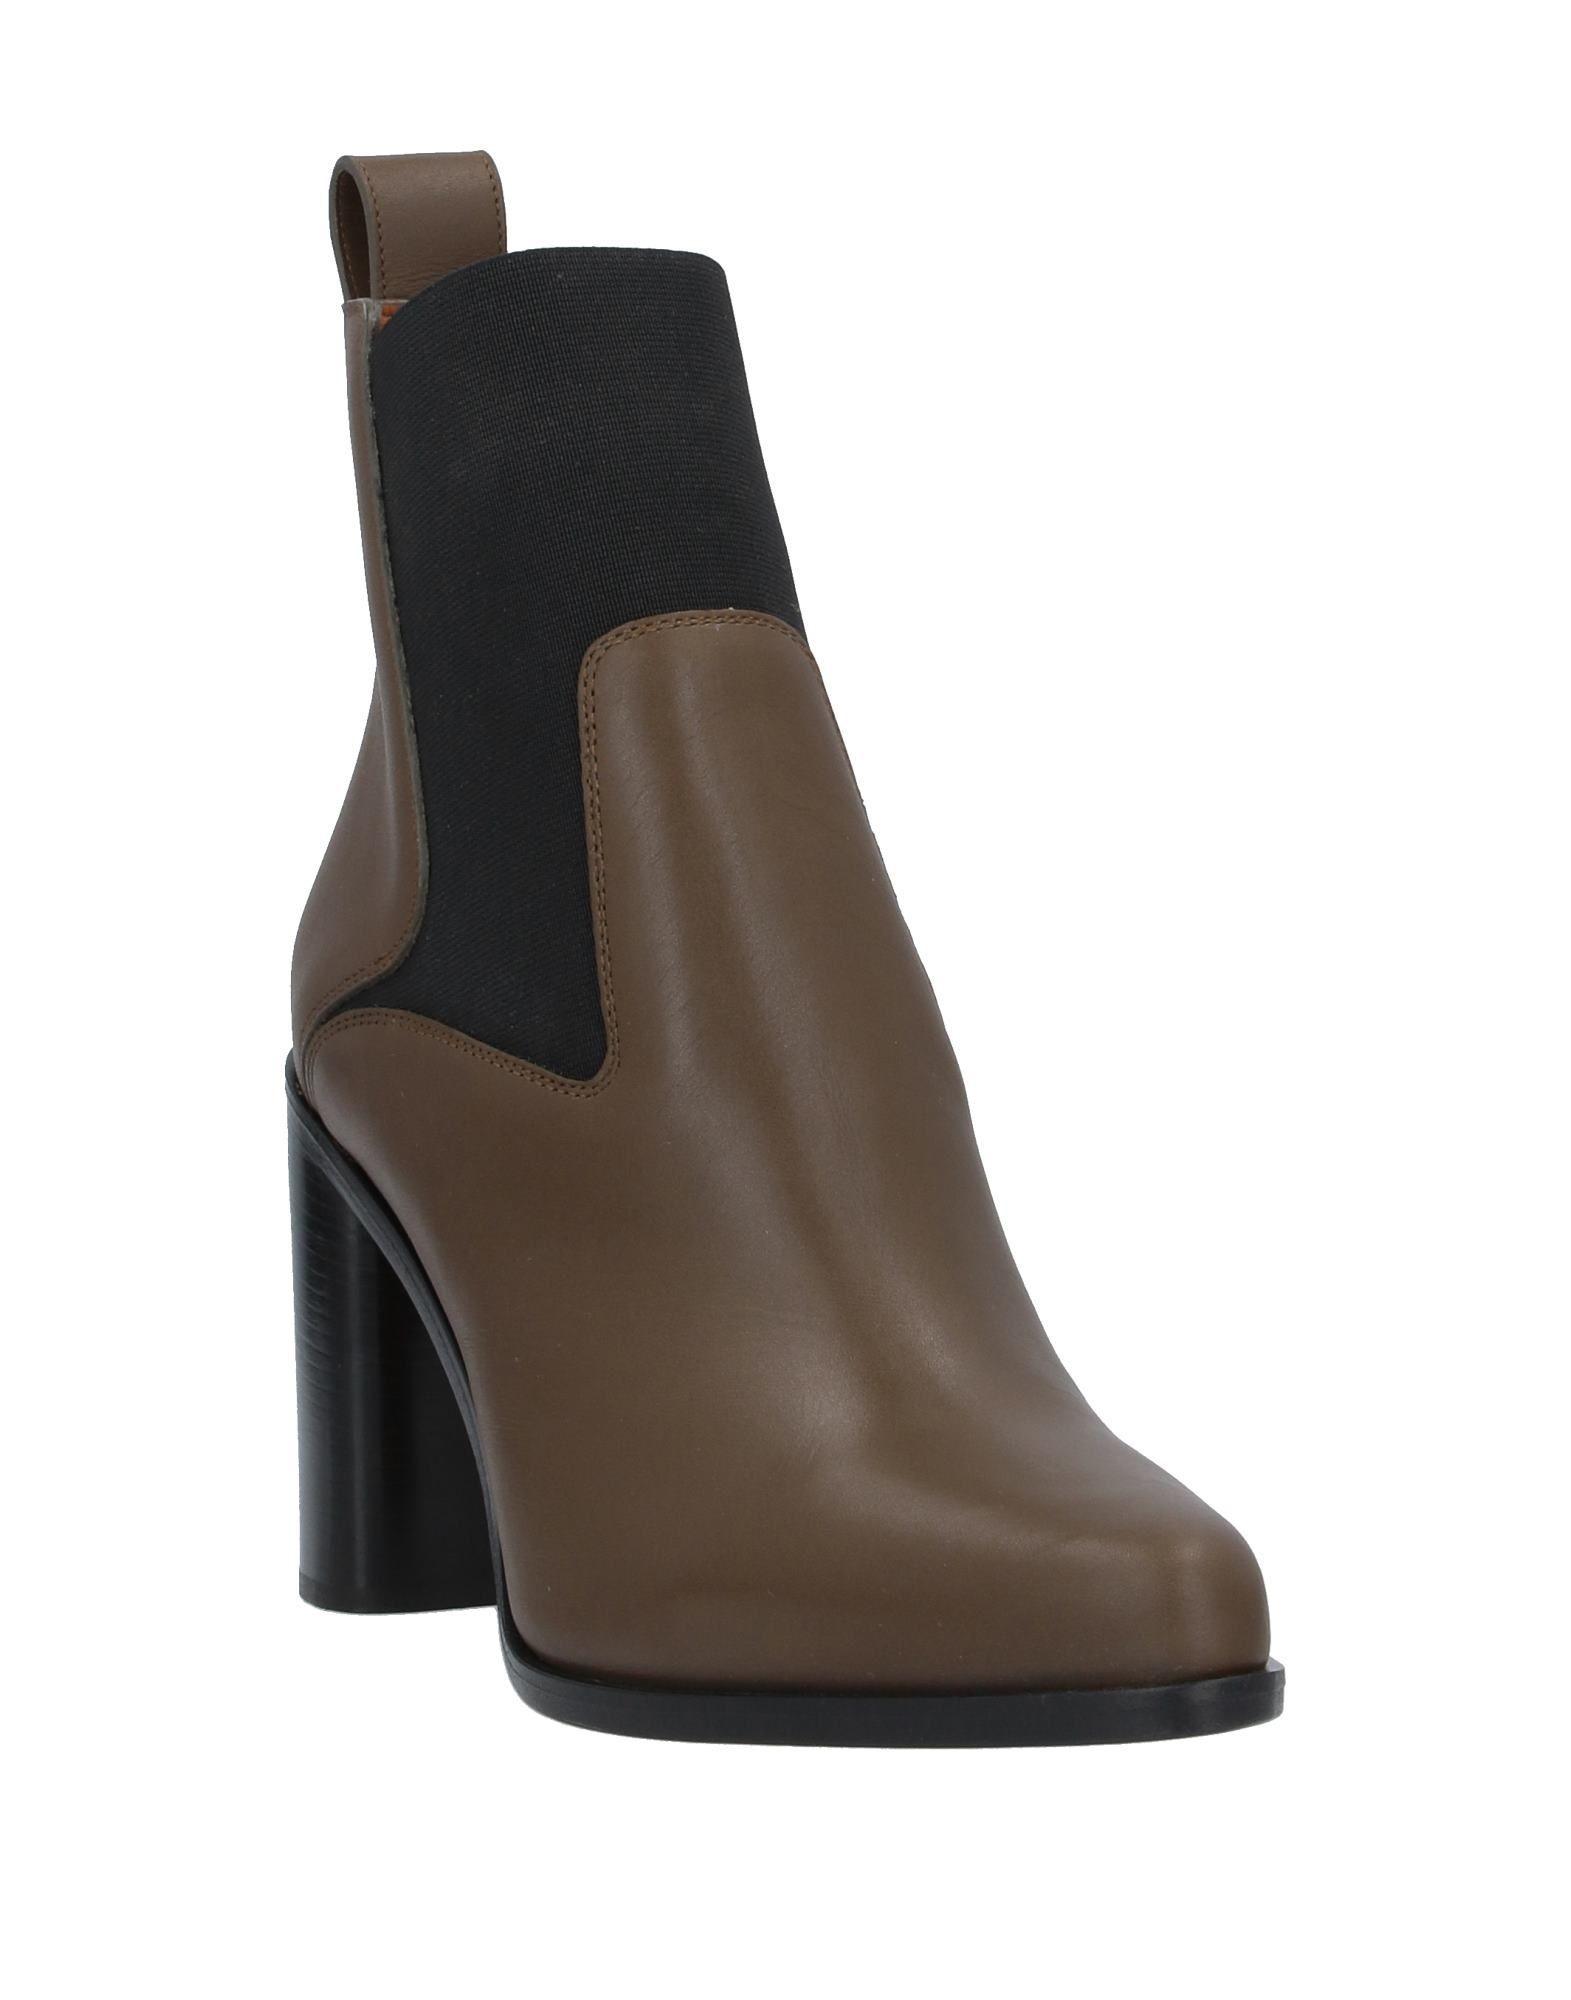 Chloe Khaki Leather Ankle Boots